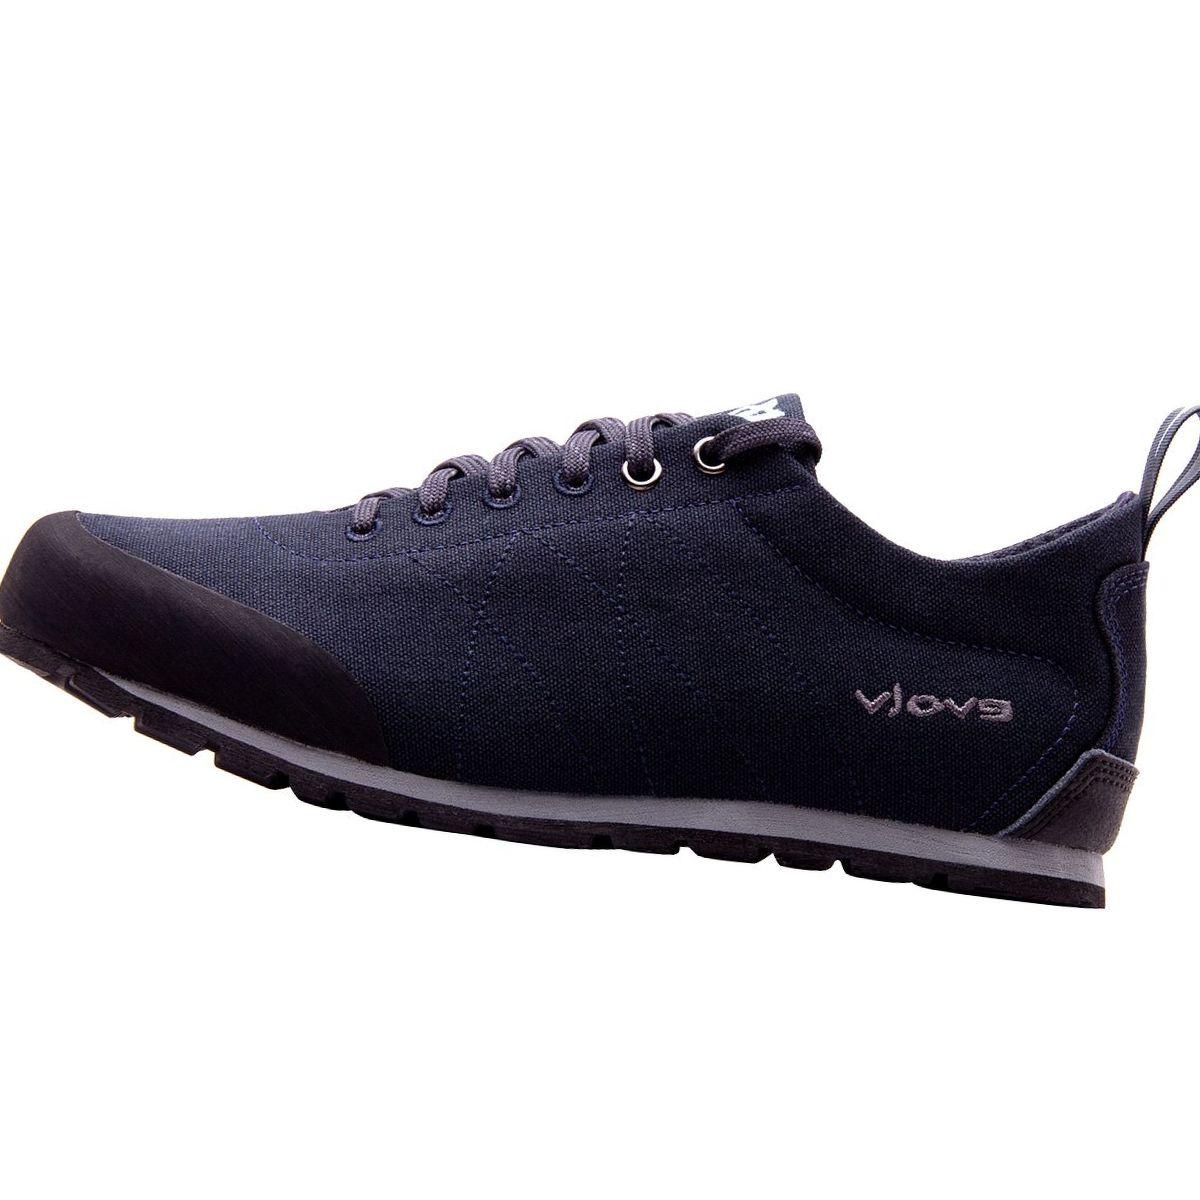 Evolv Cruzer Psyche Approach Shoe - Women's